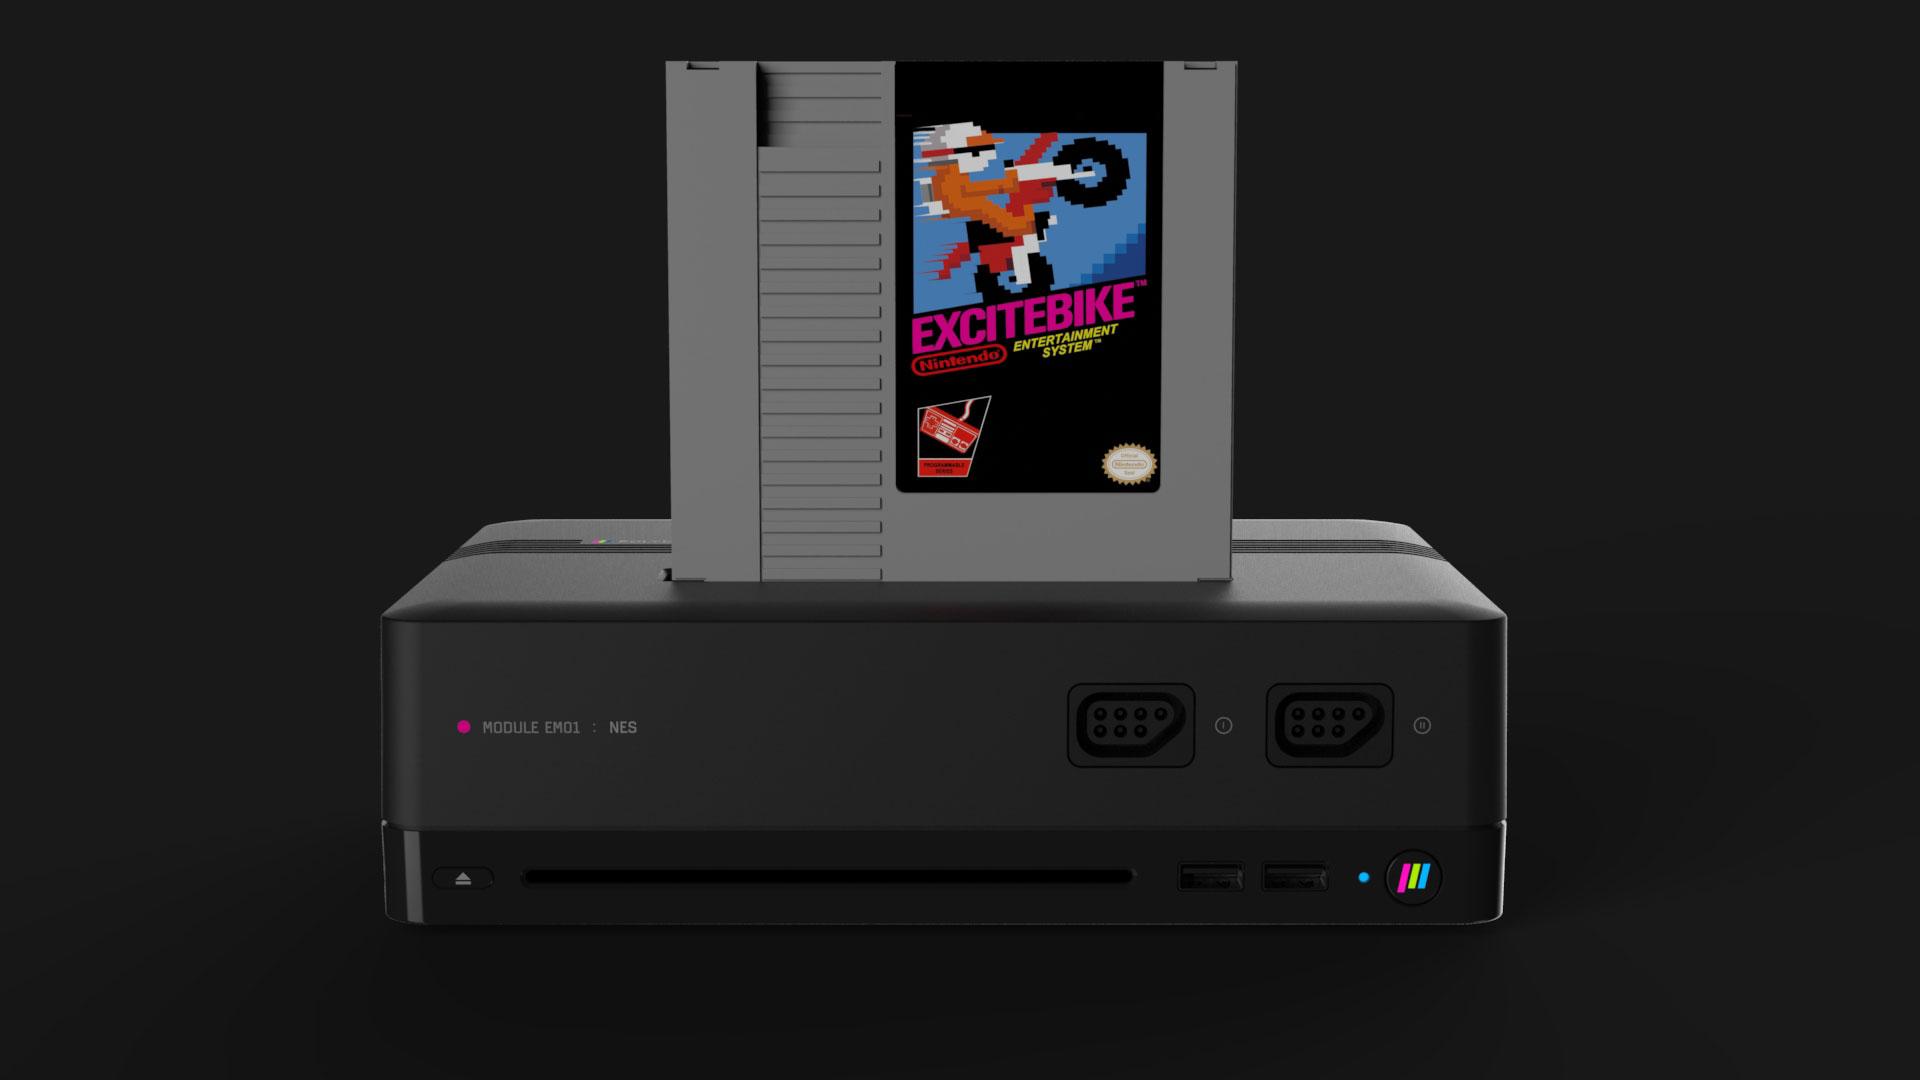 polymega nes 2 - Nowa konsola Polymega ze wsparciem m.in. dla PlayStation oraz Sega Saturn